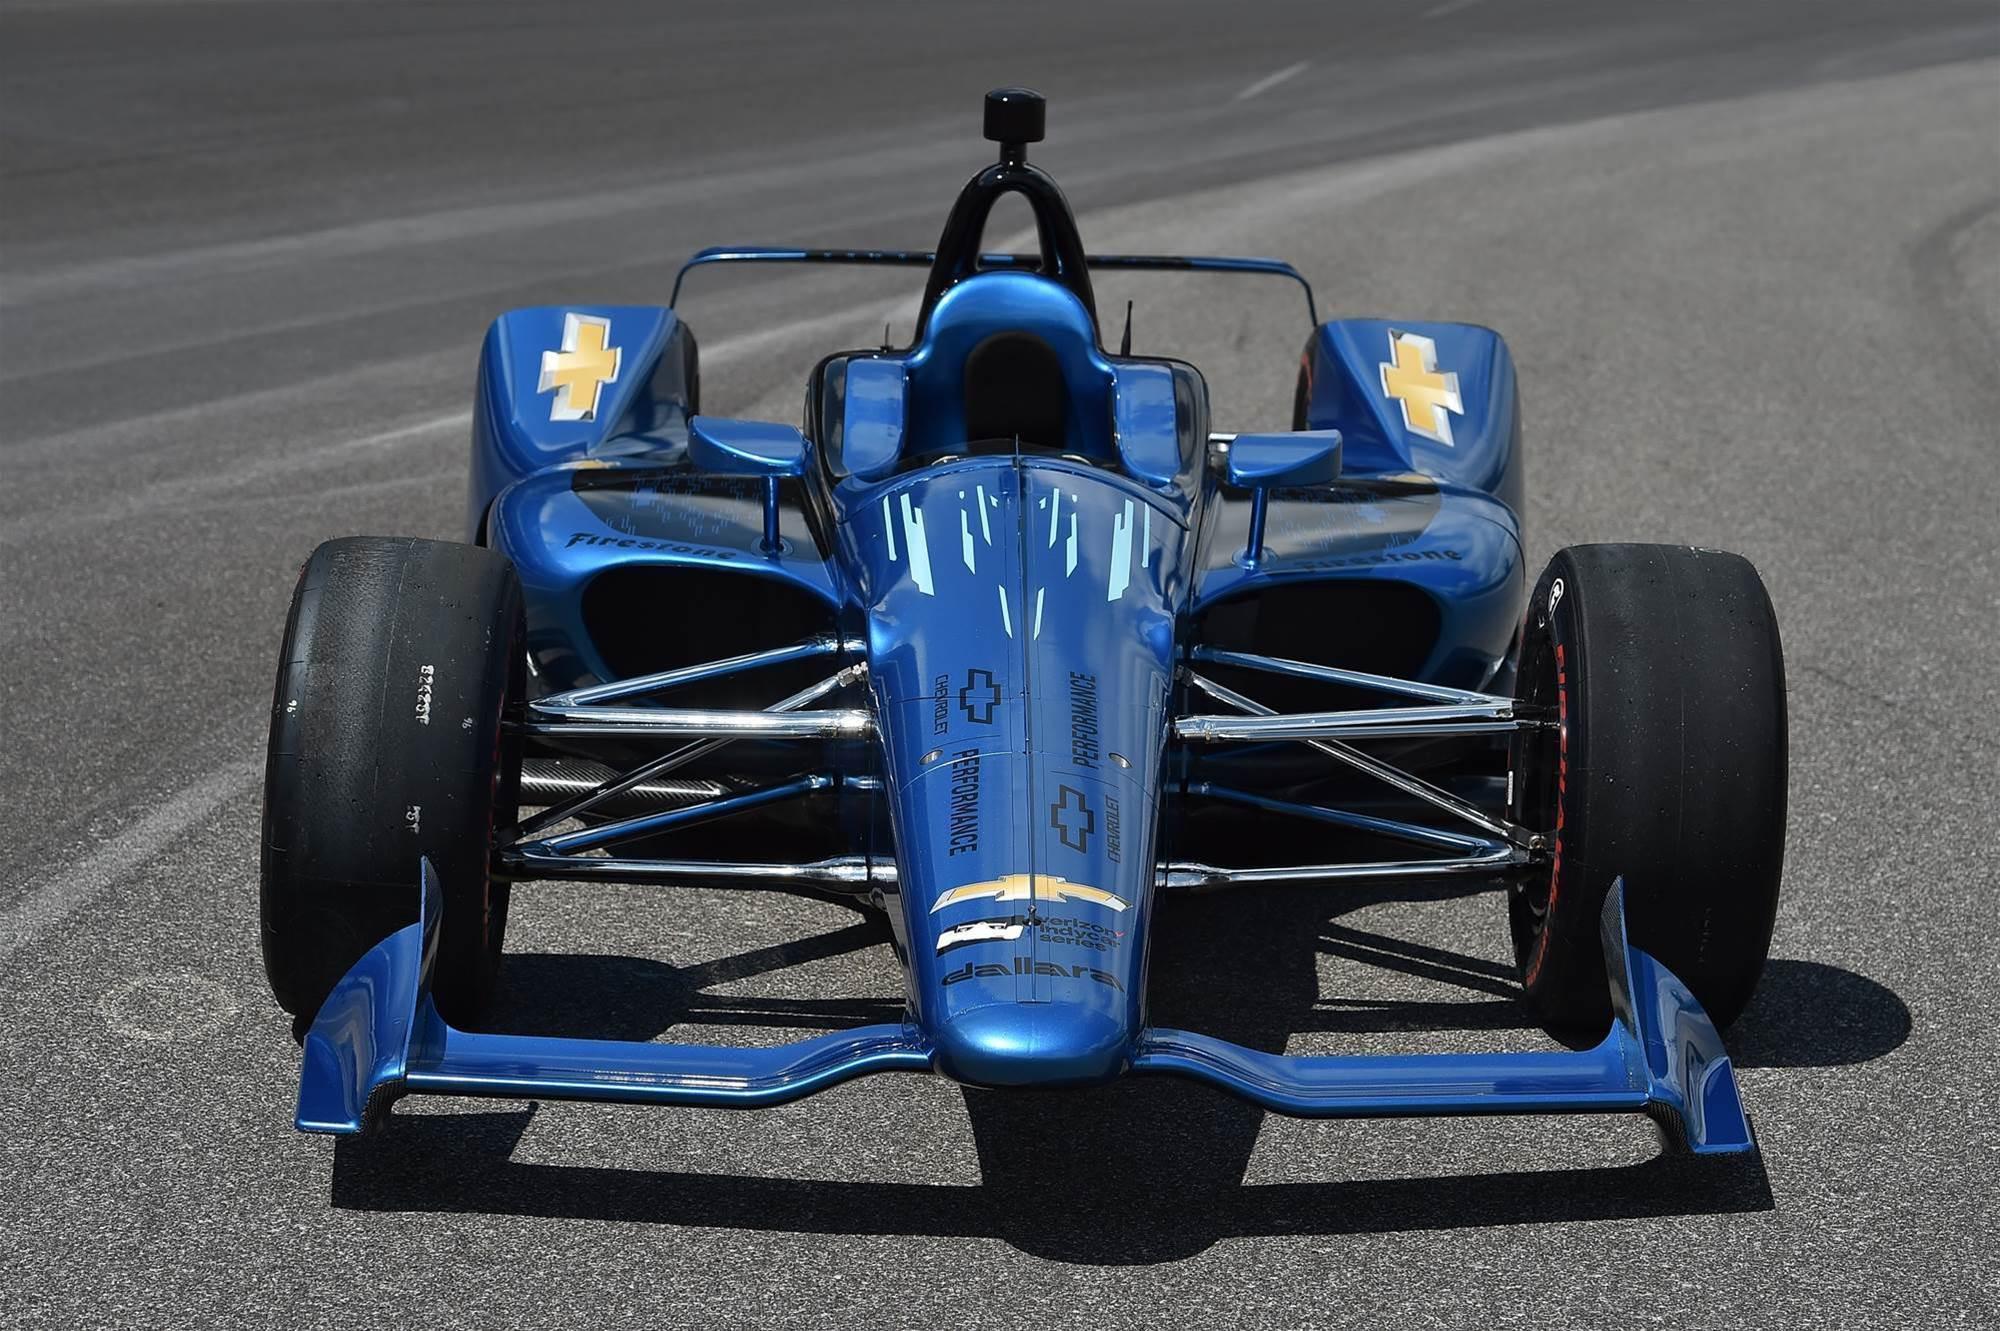 Pic gallery: 2018 Indycar